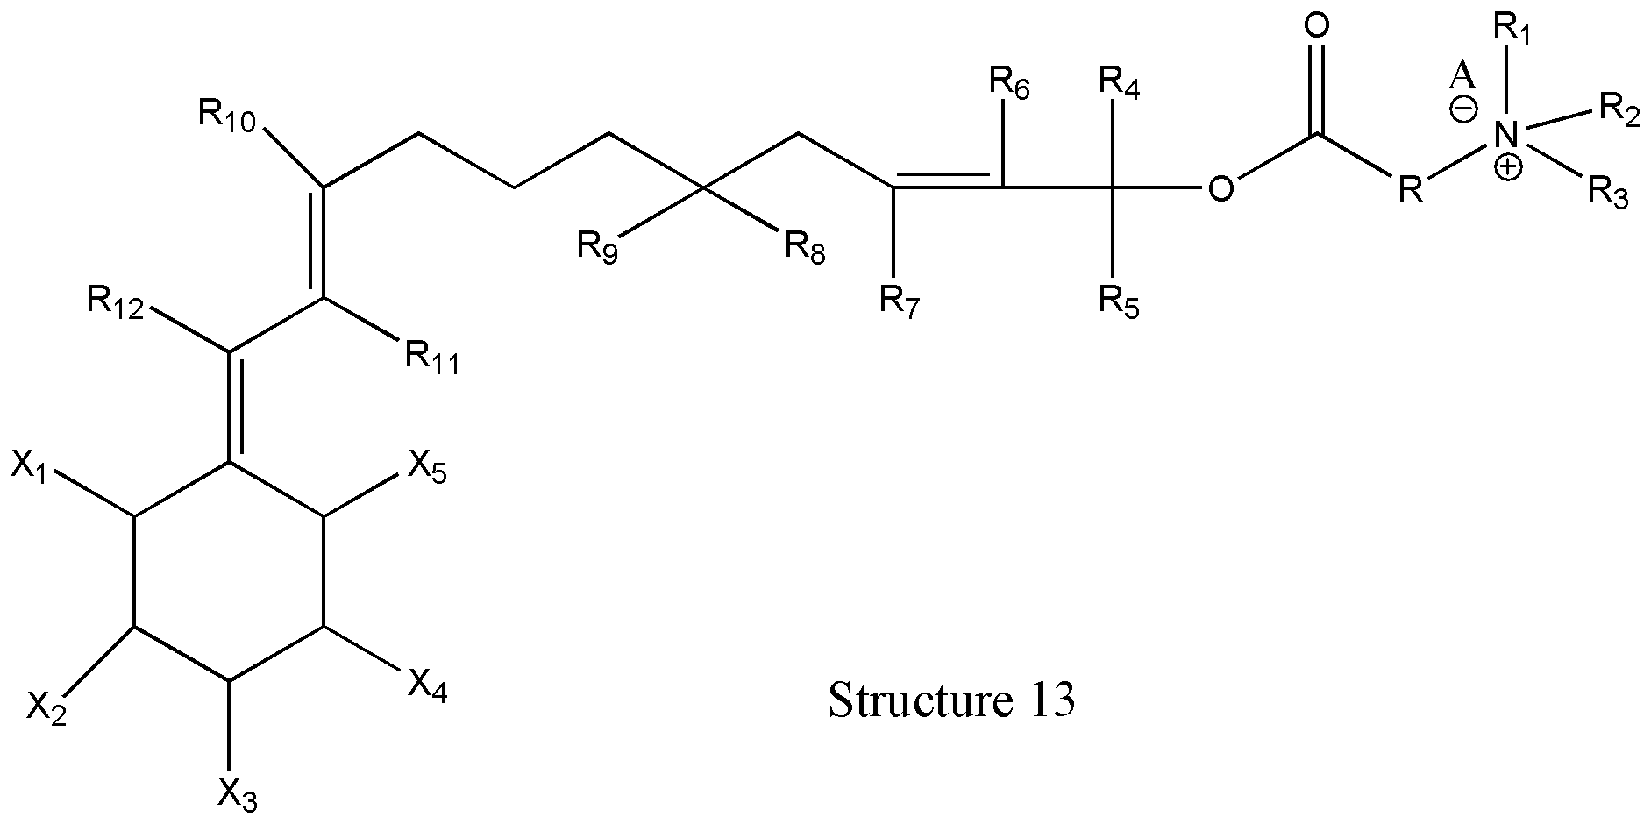 tenormin 10 mg